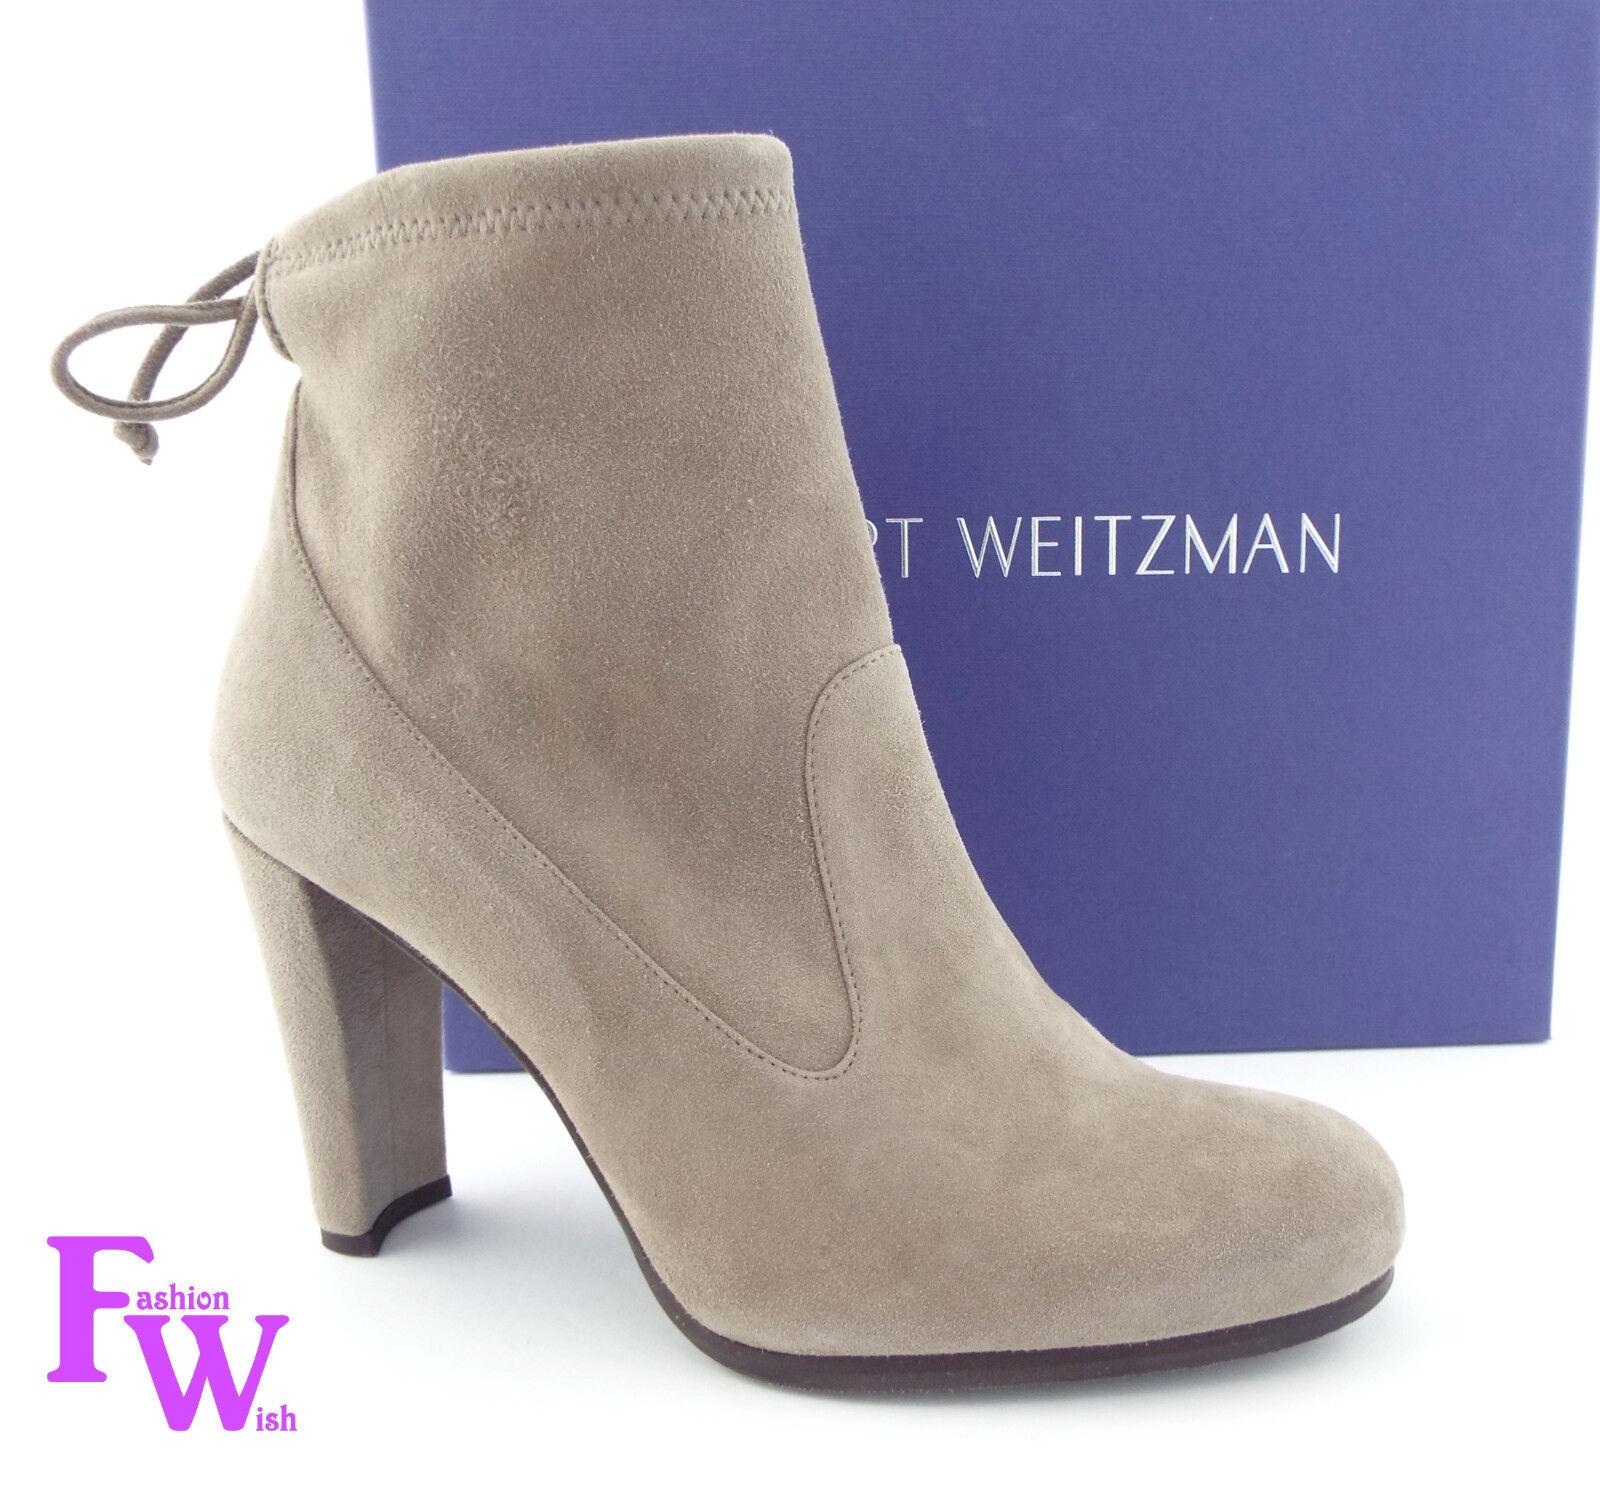 New STUART WEITZMAN Size 8 GLOVE Topo Suede Ankle Booties Boots NIB Dust bag